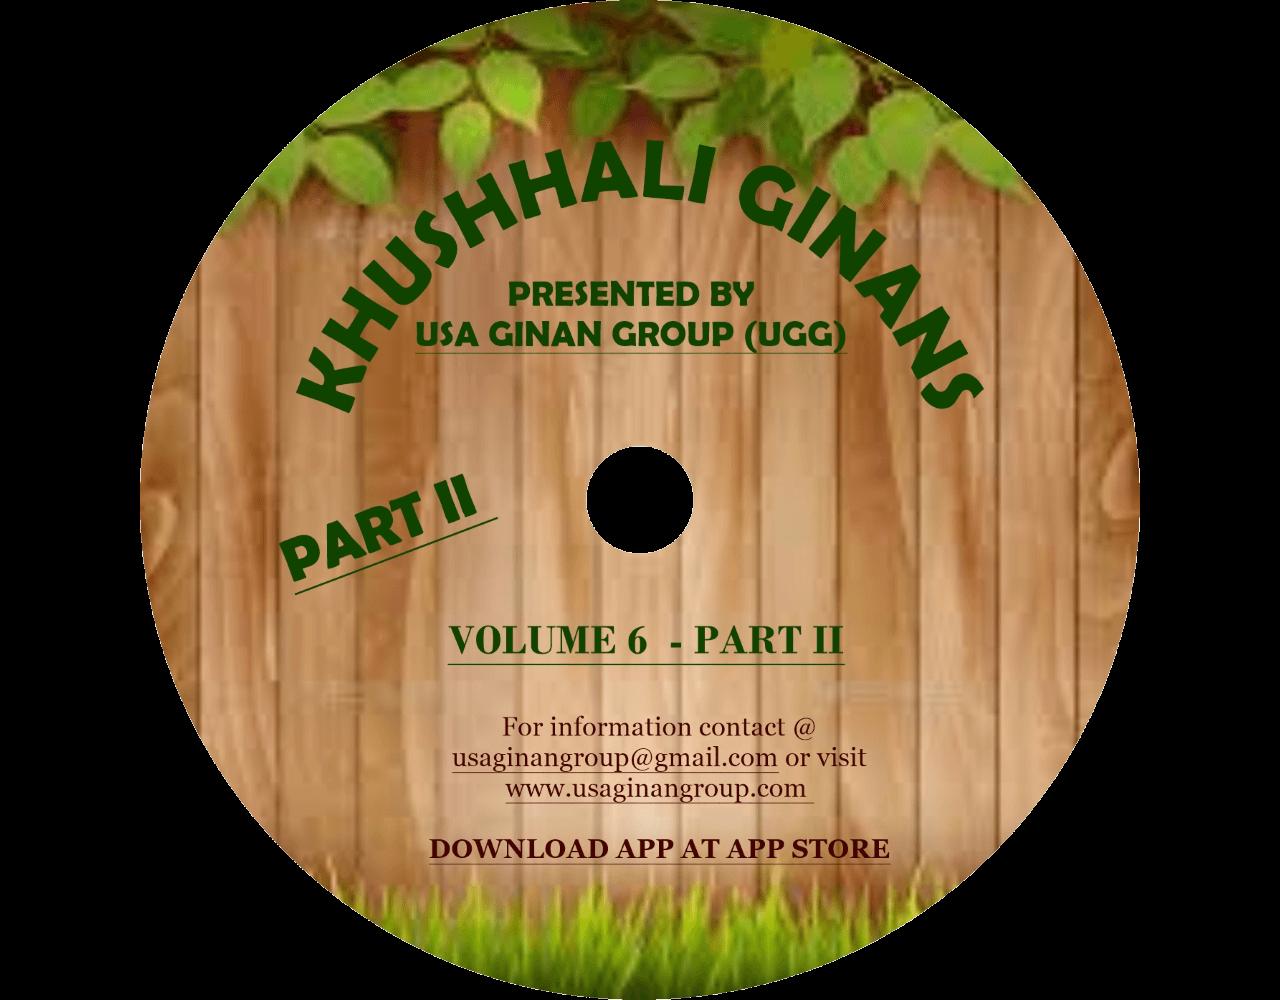 Khushhali Ginans